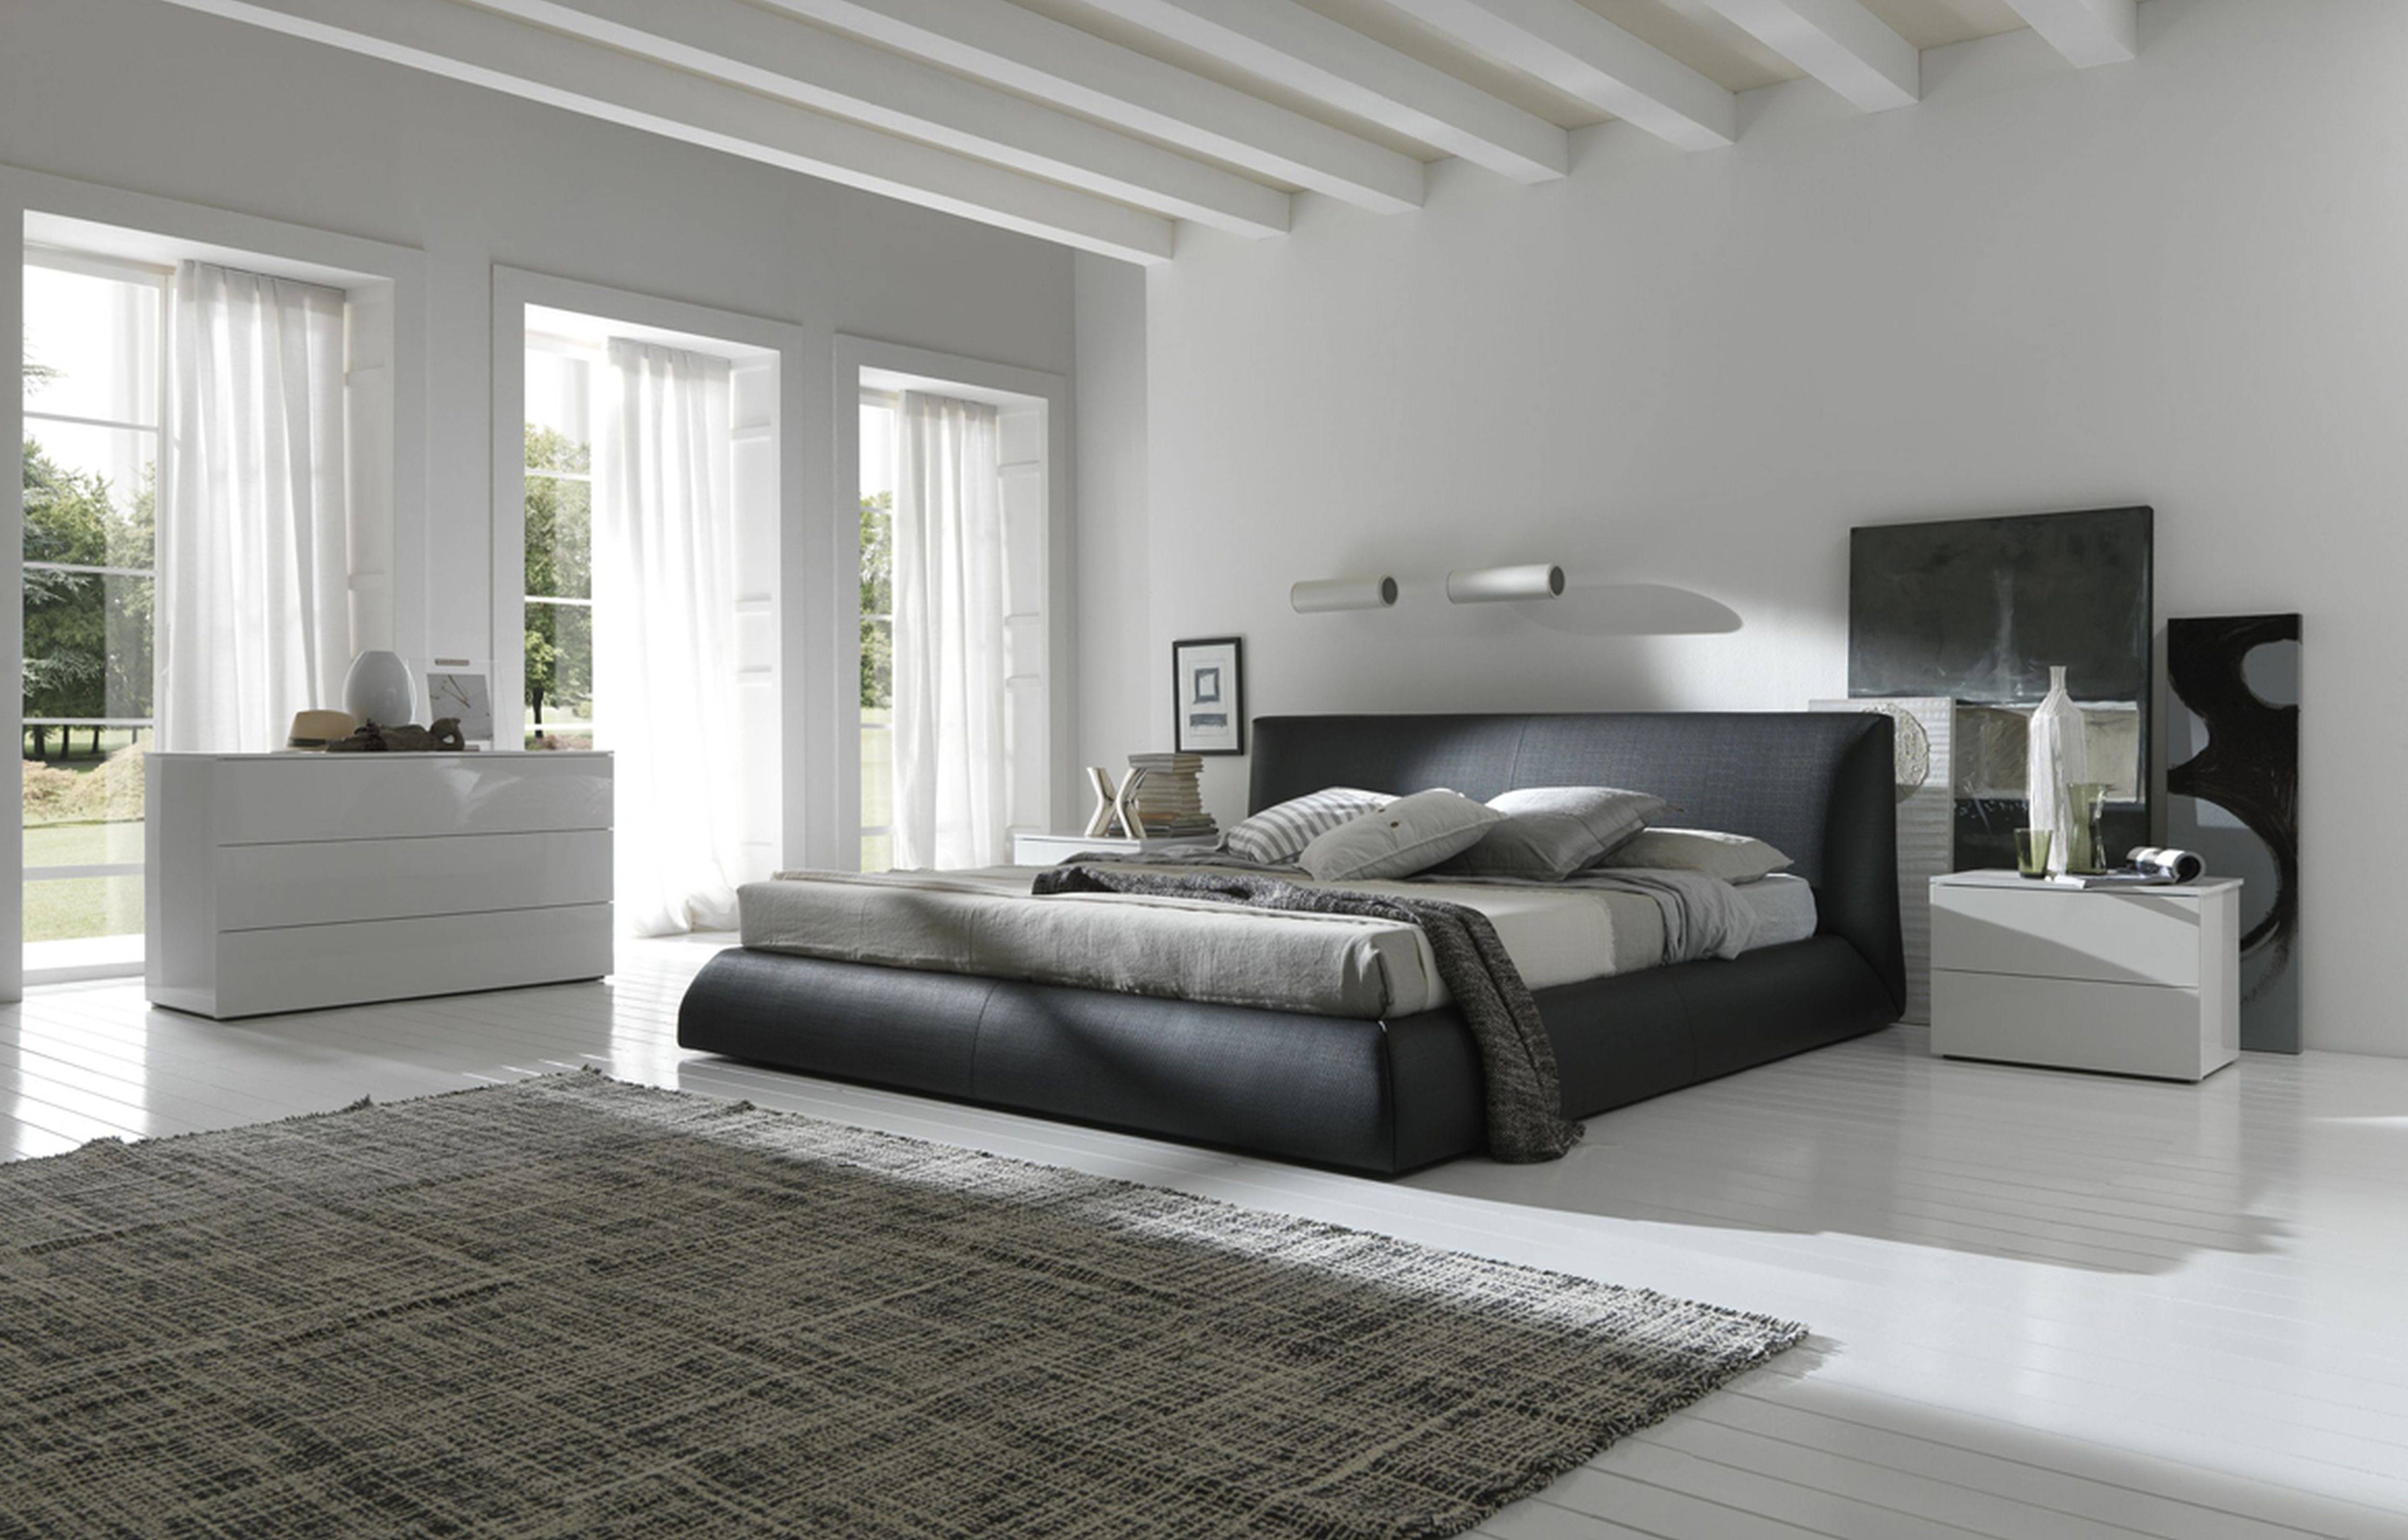 bedroom design for women. Brilliant Bedroom Rug Bed Pillows Cabinet Vases Inside Bedroom Design For Women R